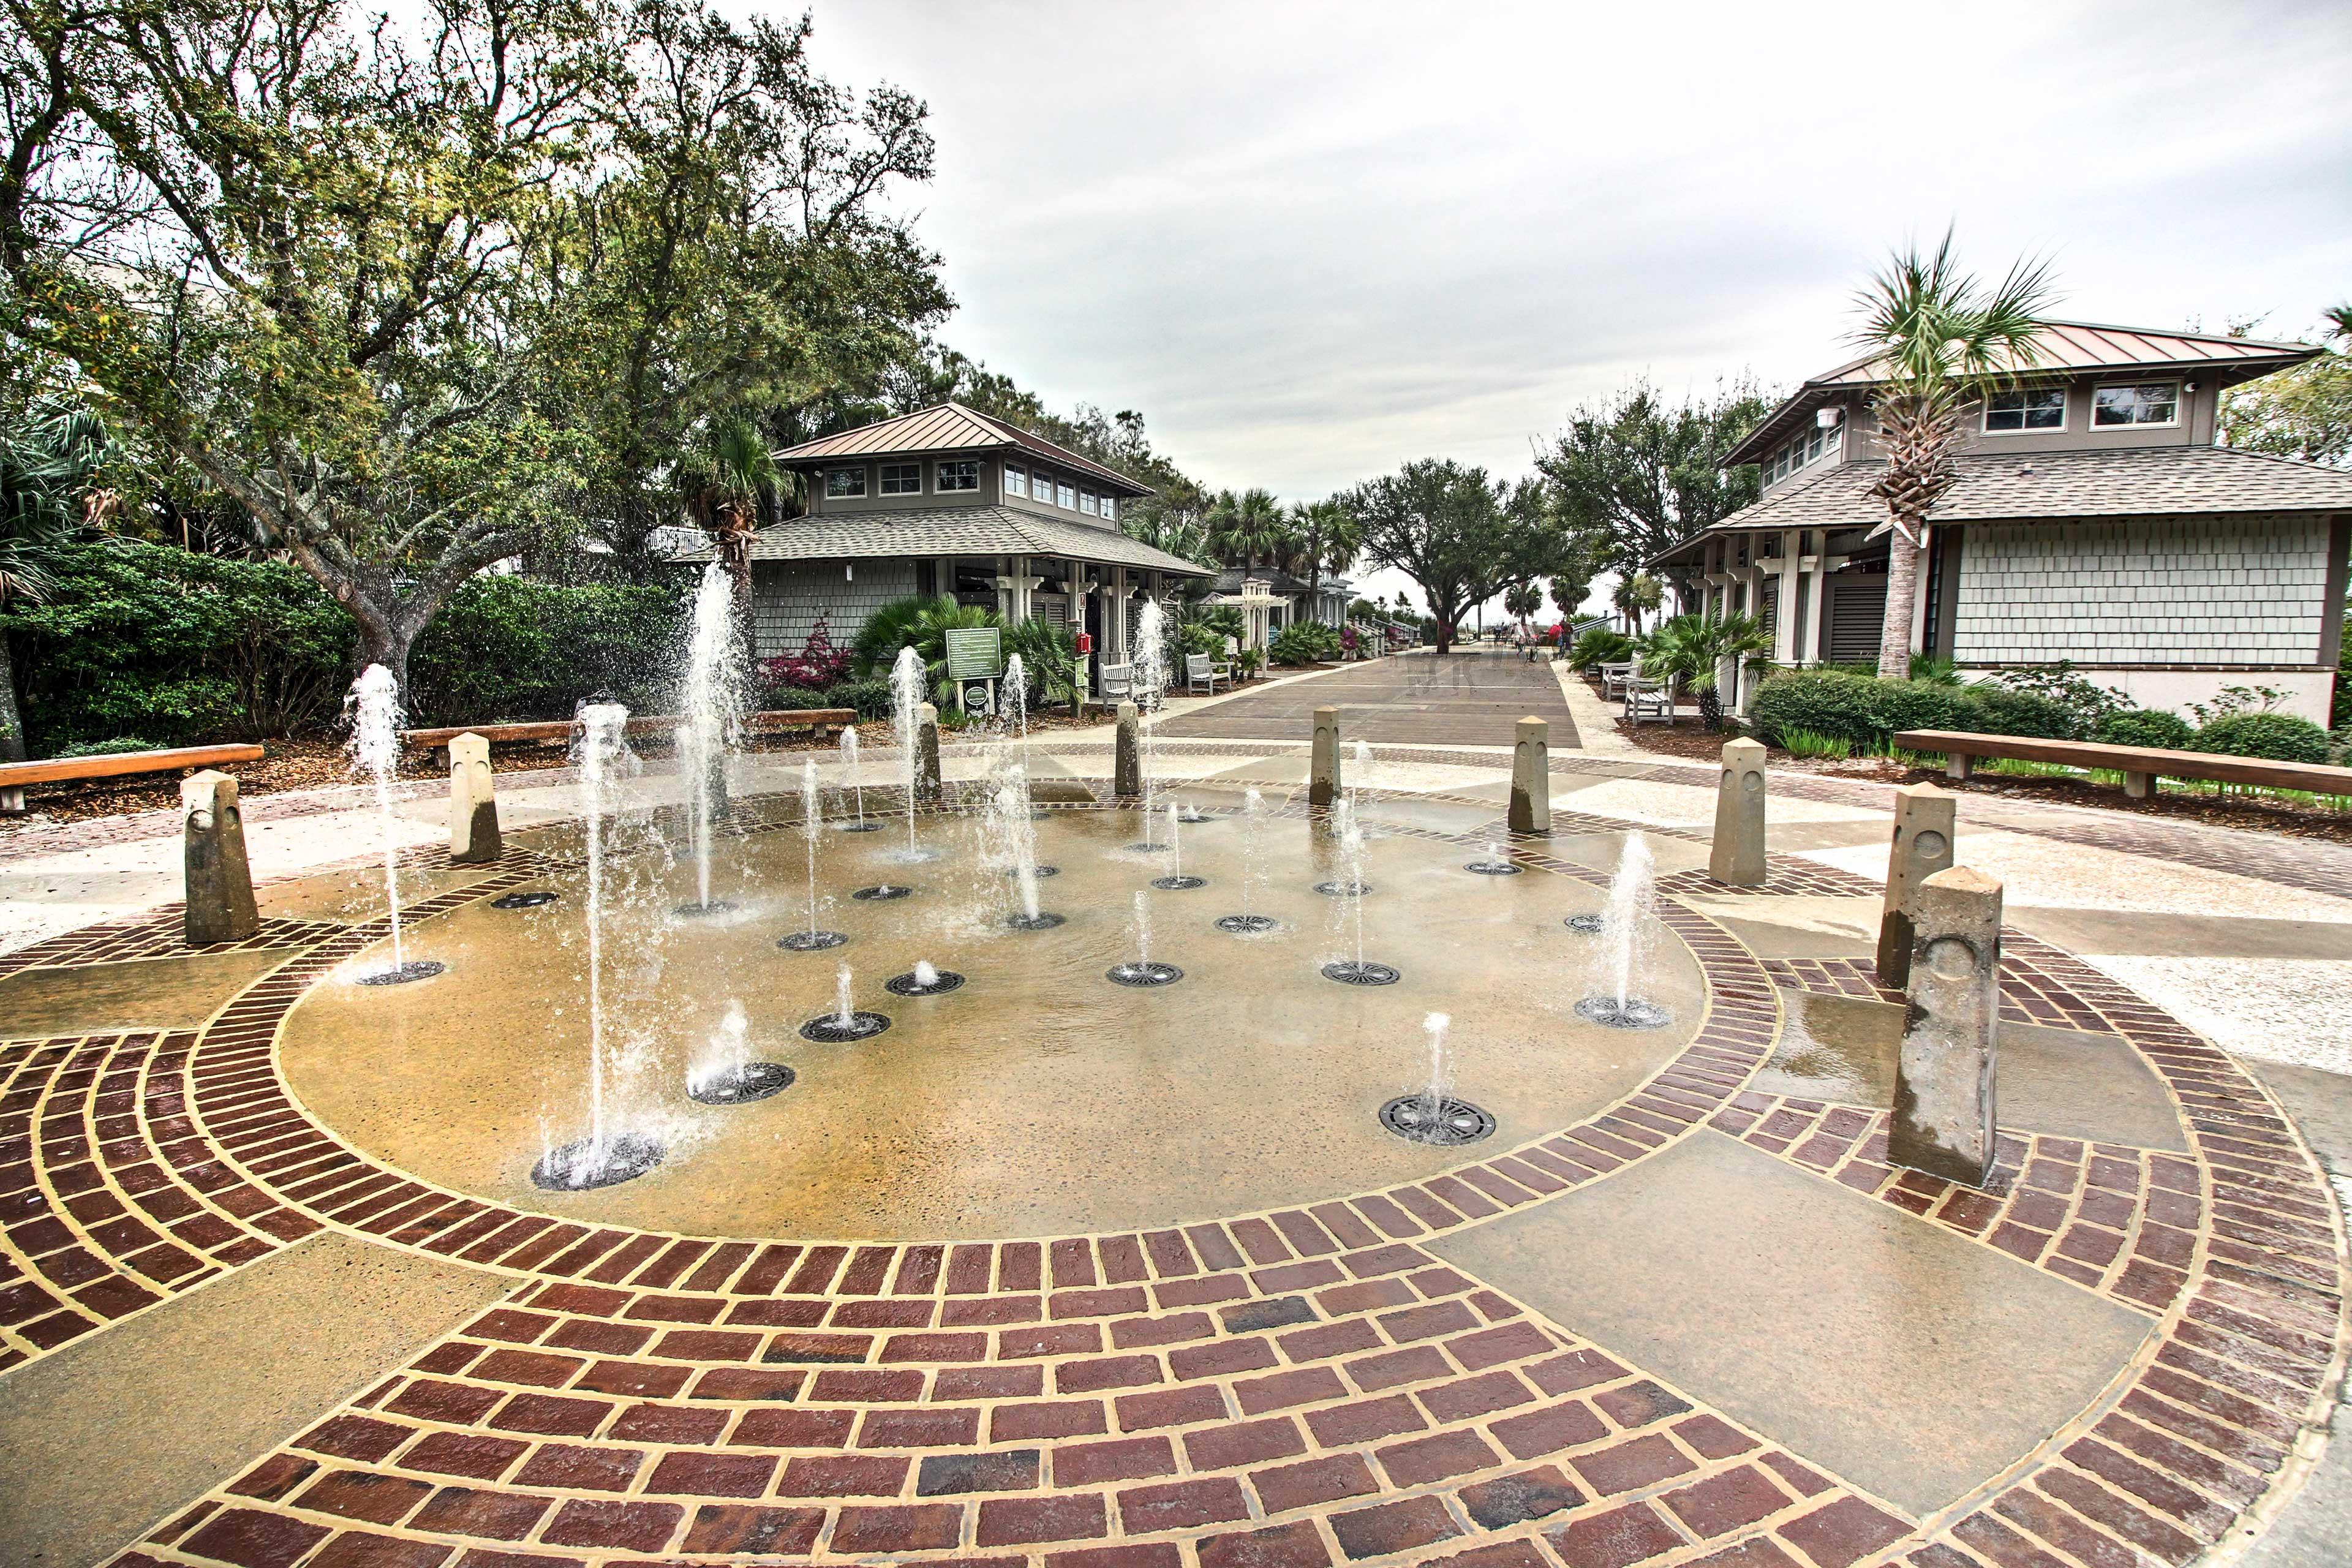 Coligny Beach Plaza